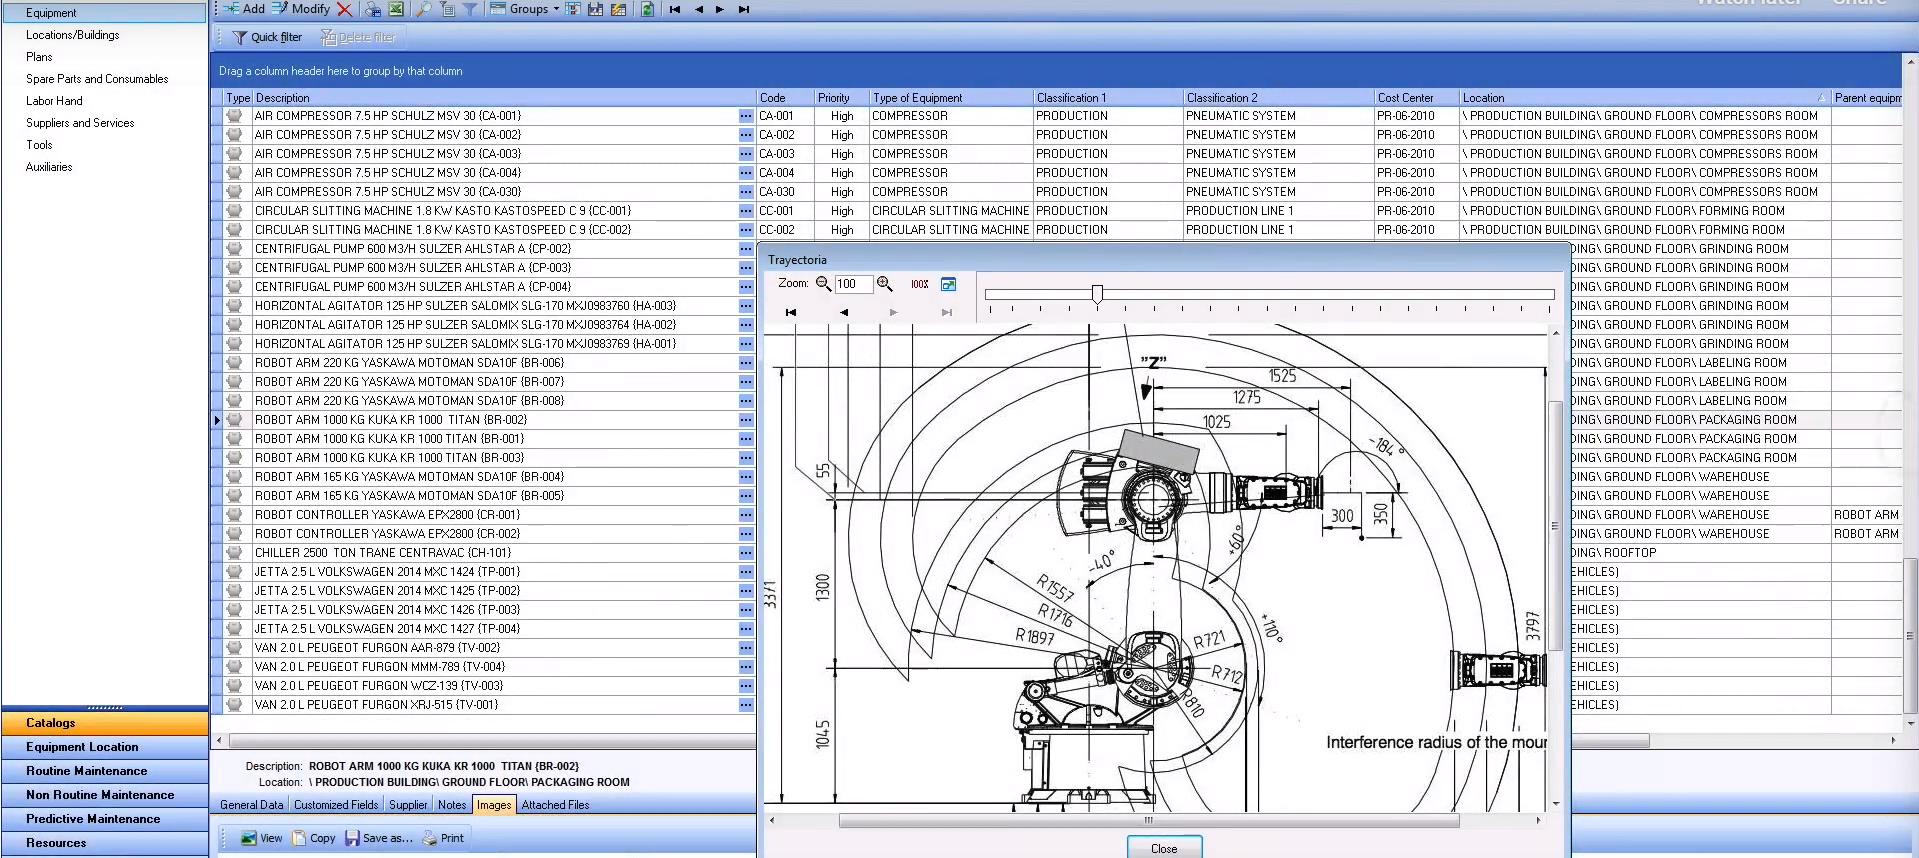 MPSoftware document viewer